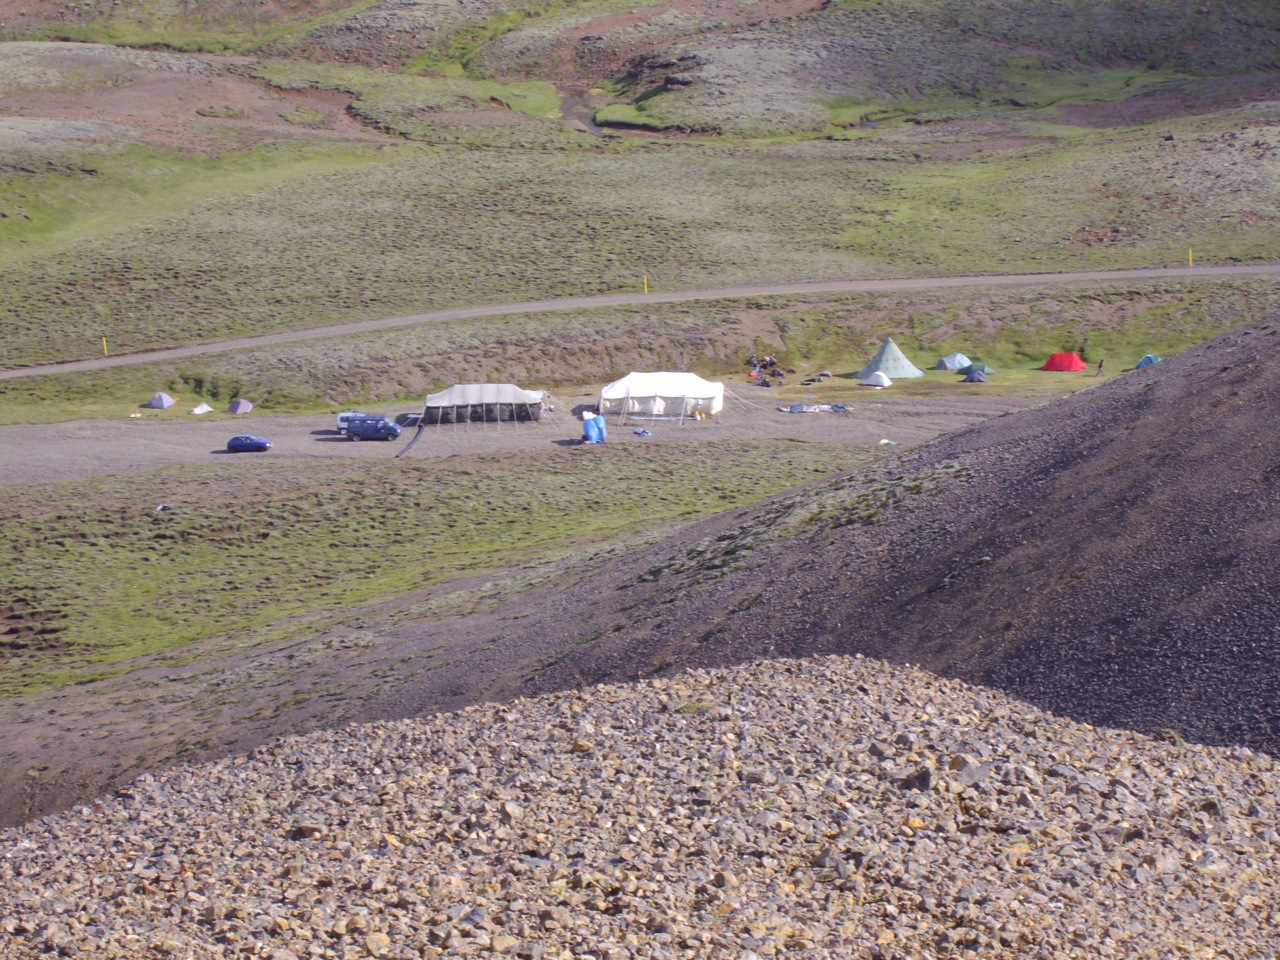 Camp in Hengill